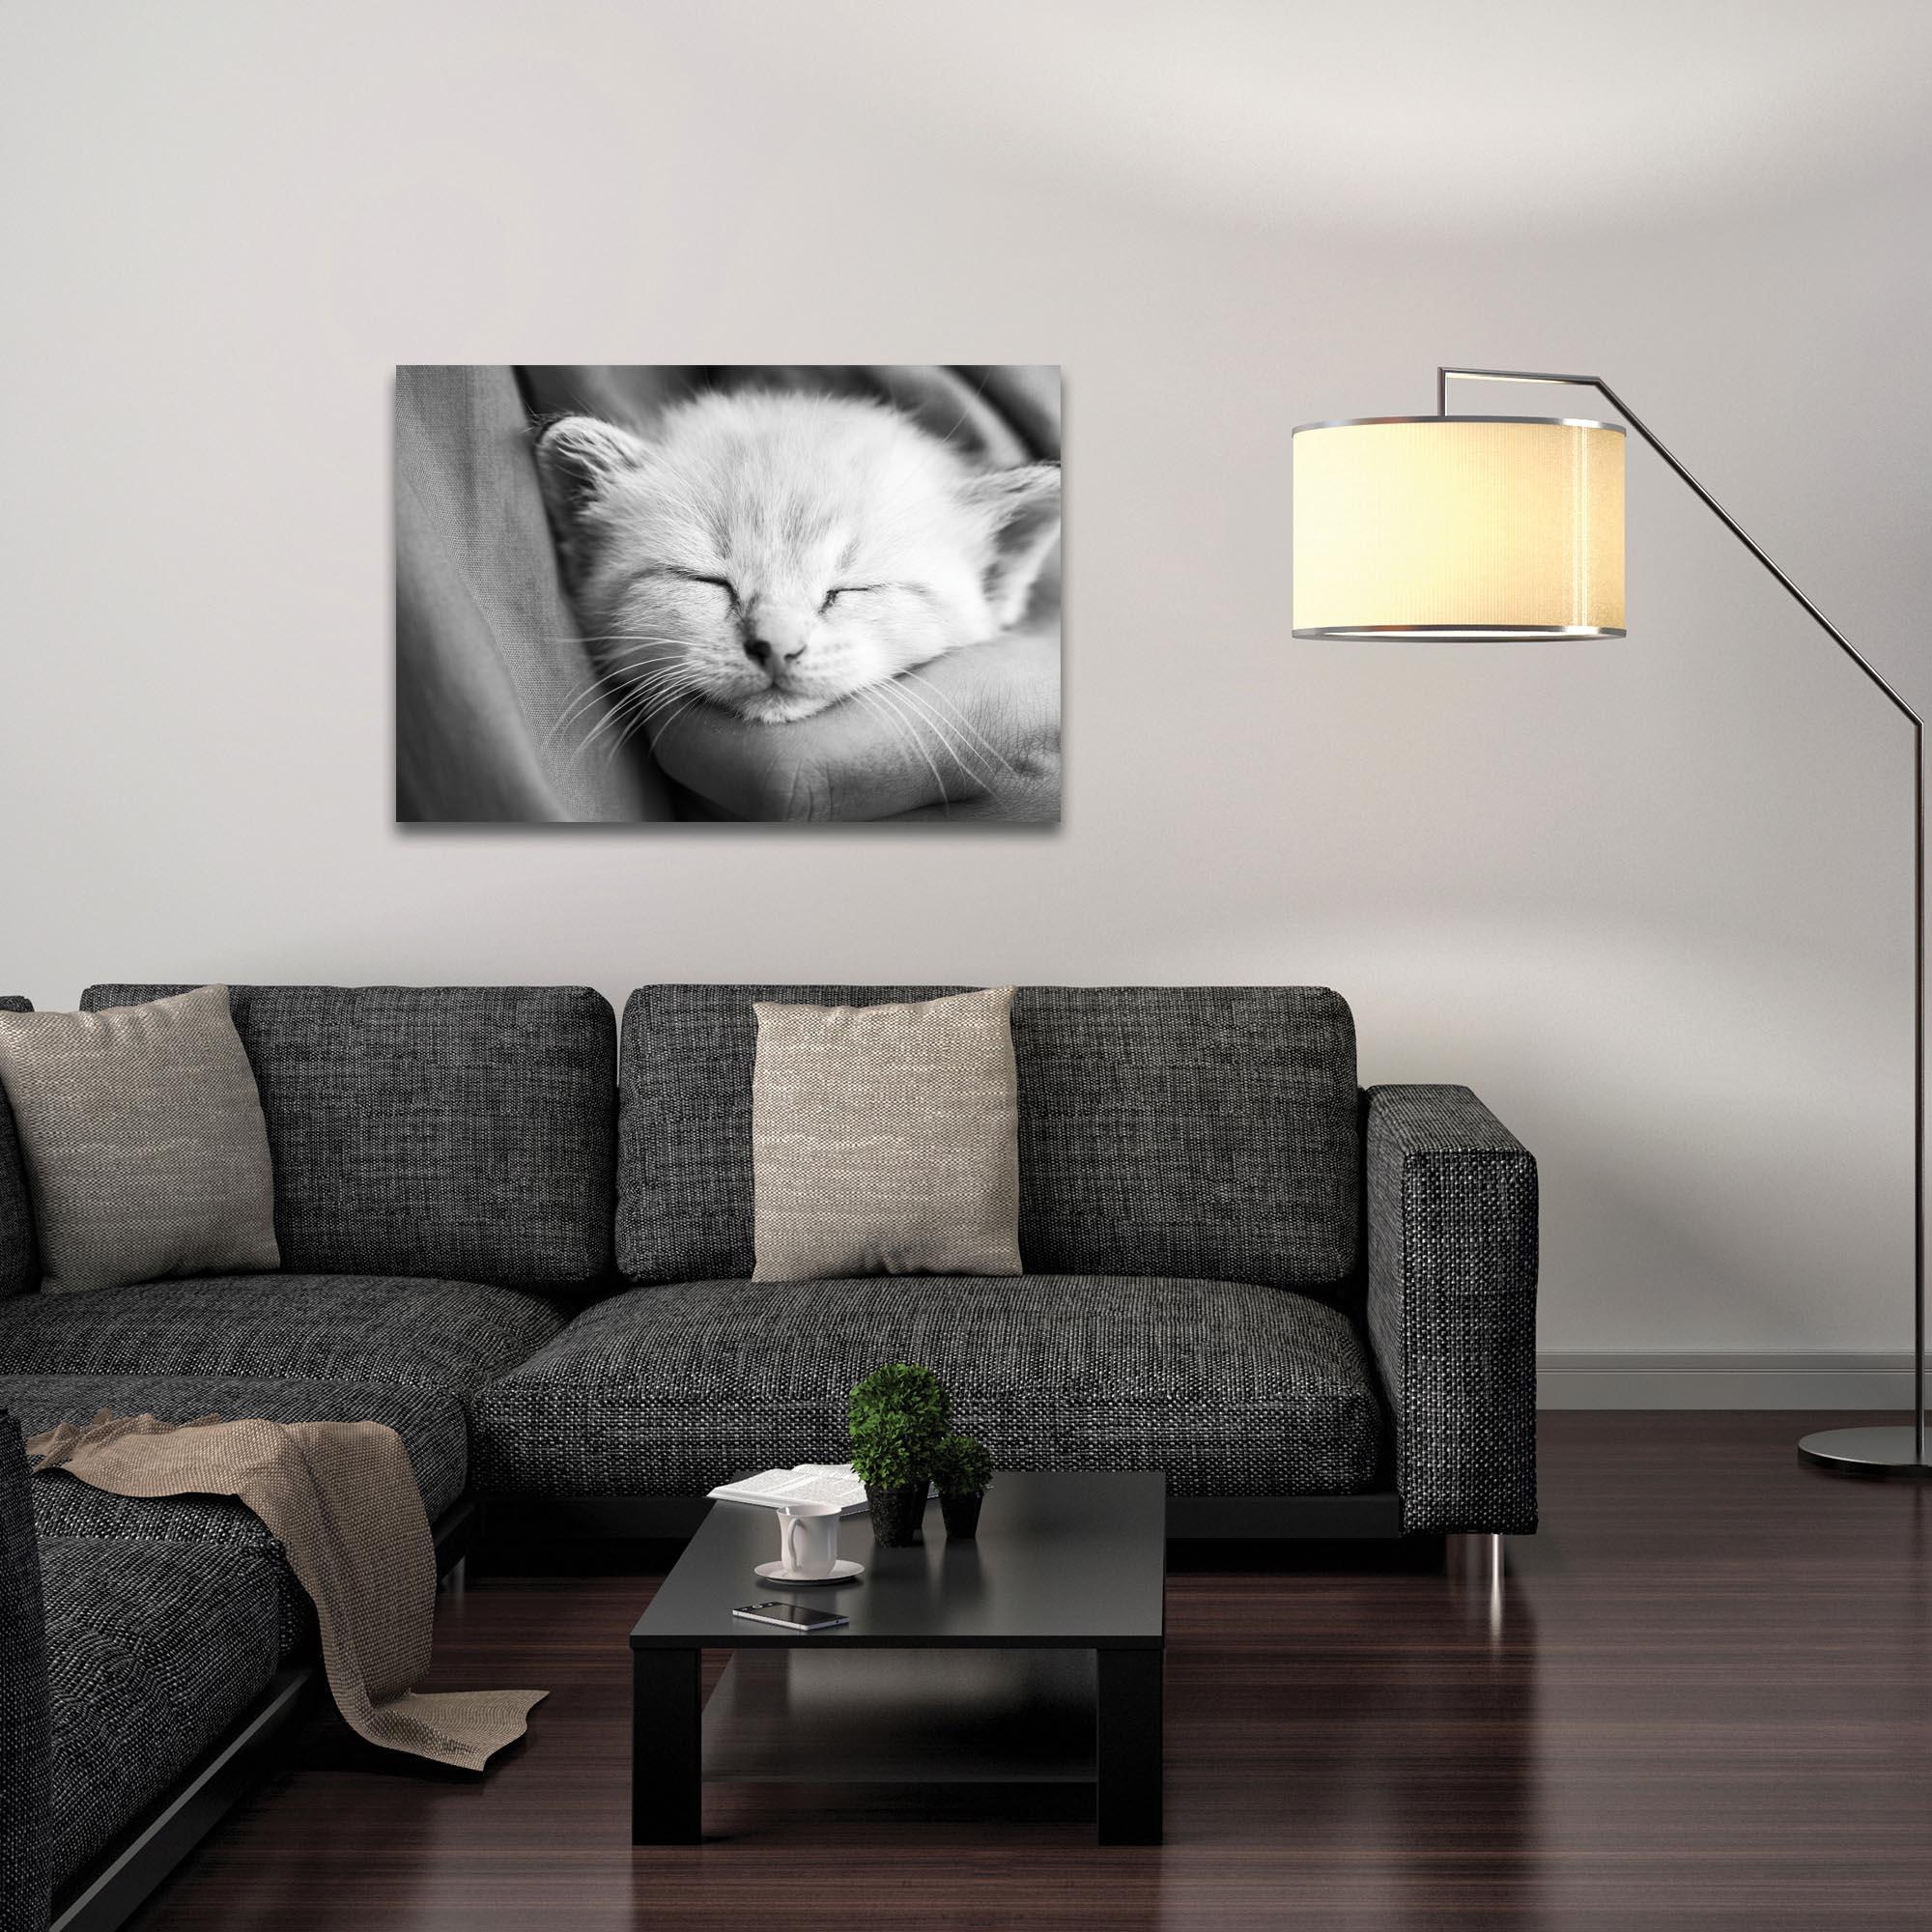 Casual Wall Art 'Kitten Dreams' - Wildlife Decor on Metal or Plexiglass - Lifestyle View